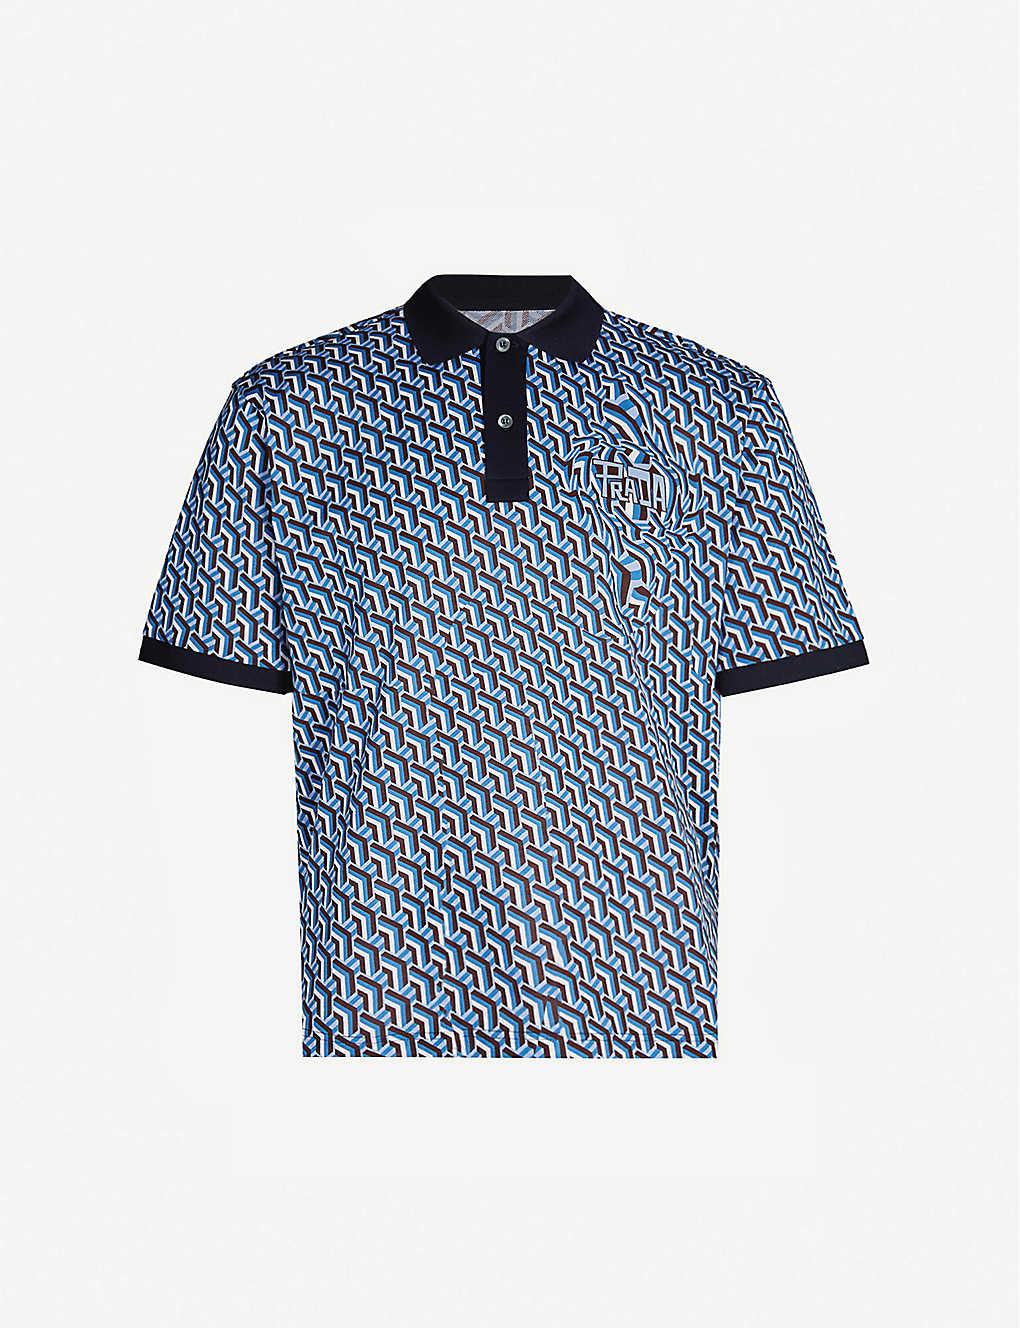 c2778fce6 PRADA - Geometric-patterned cotton-piqué polo shirt | Selfridges.com